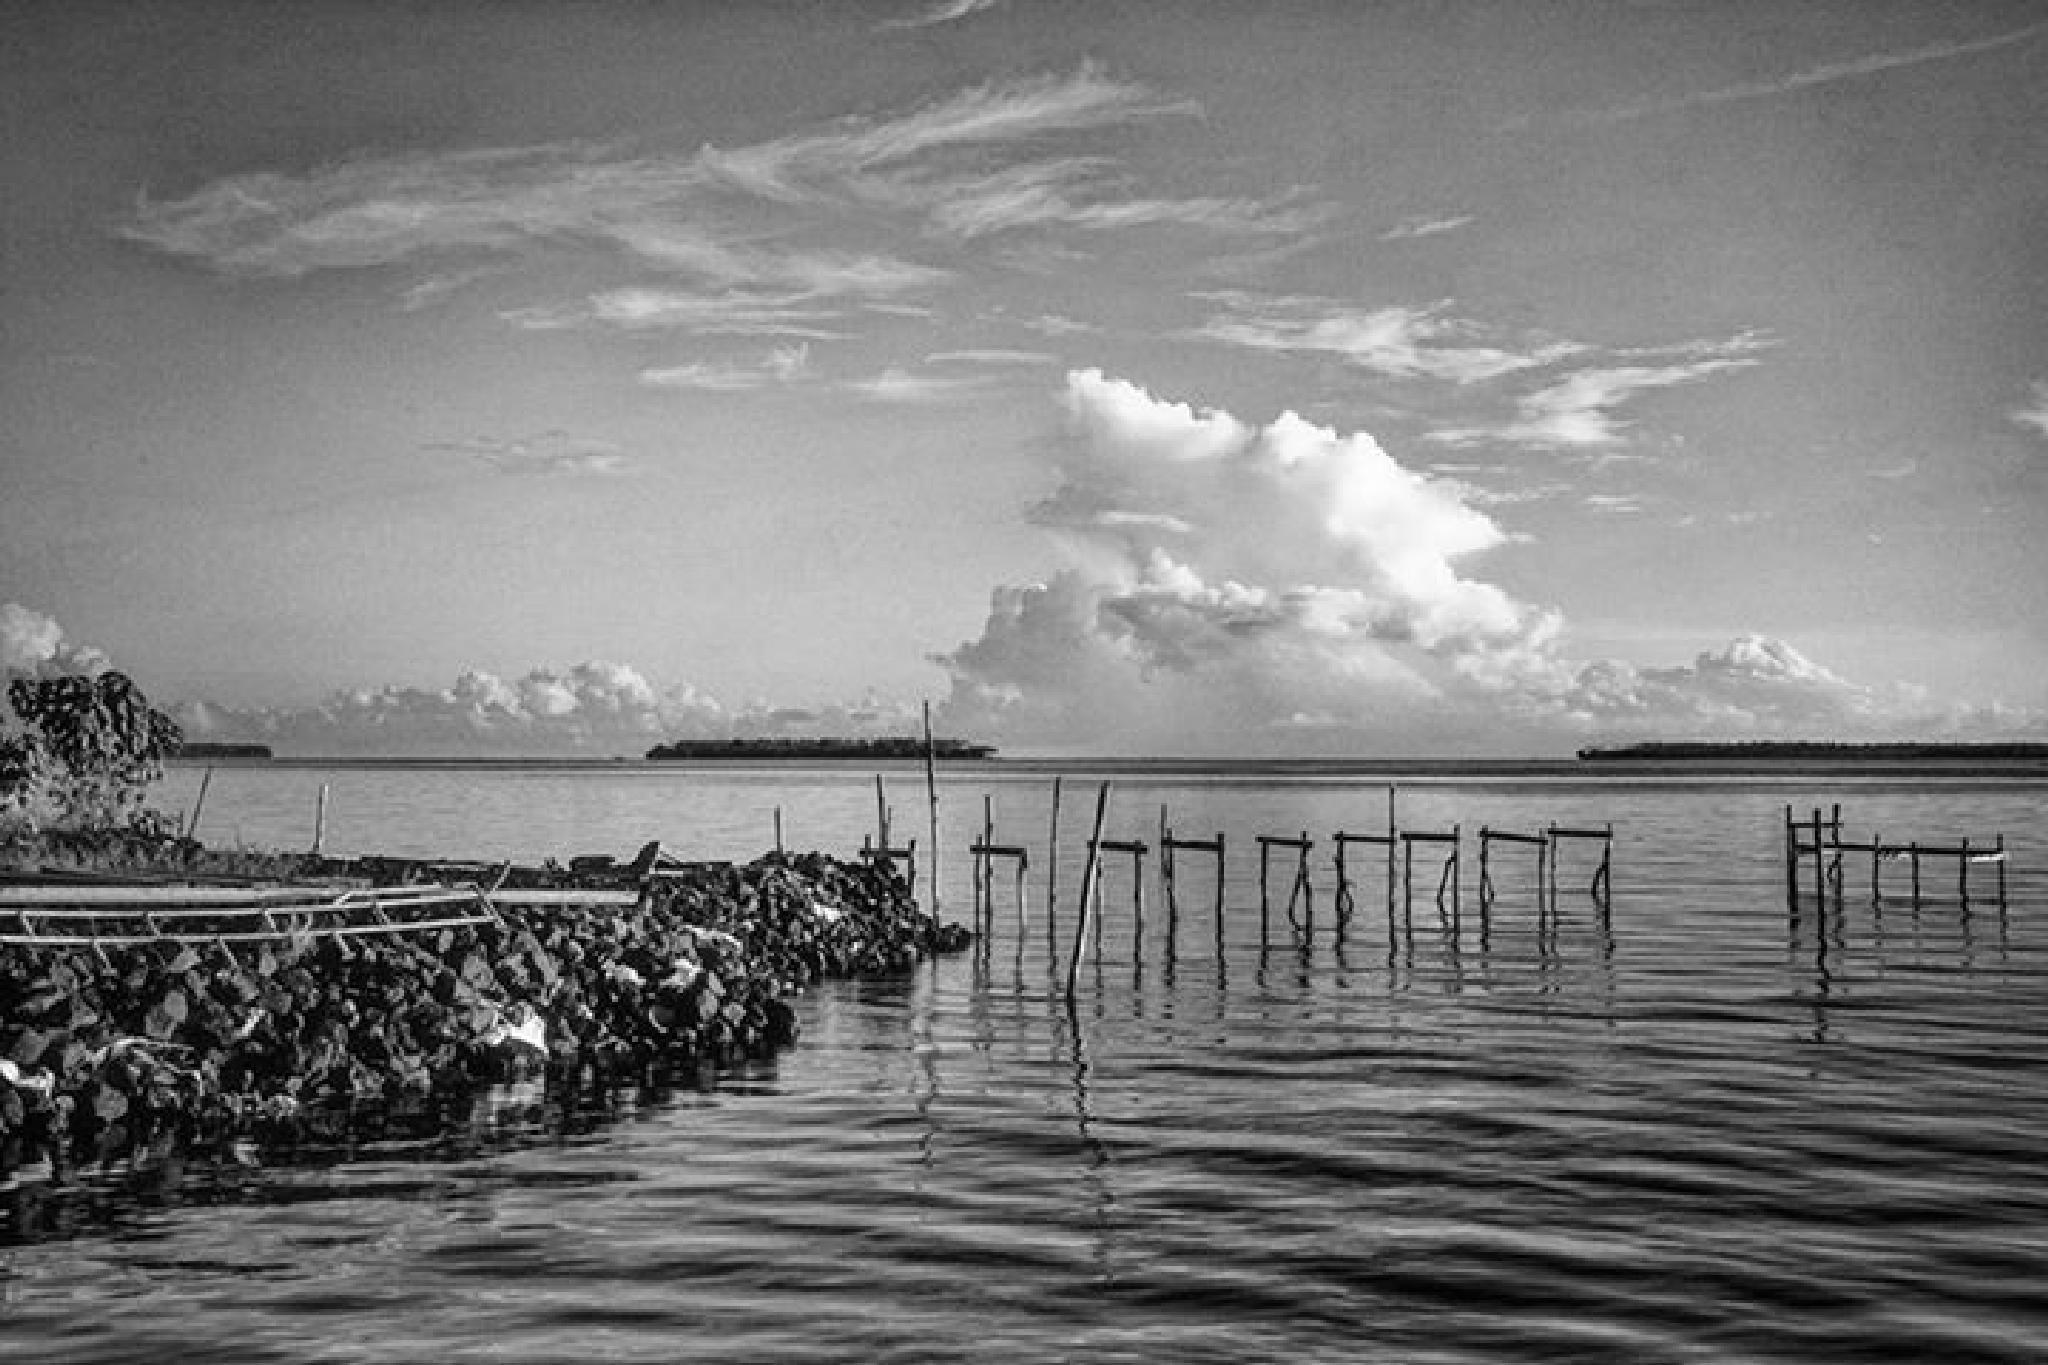 Ruins pier by Tri Handoko